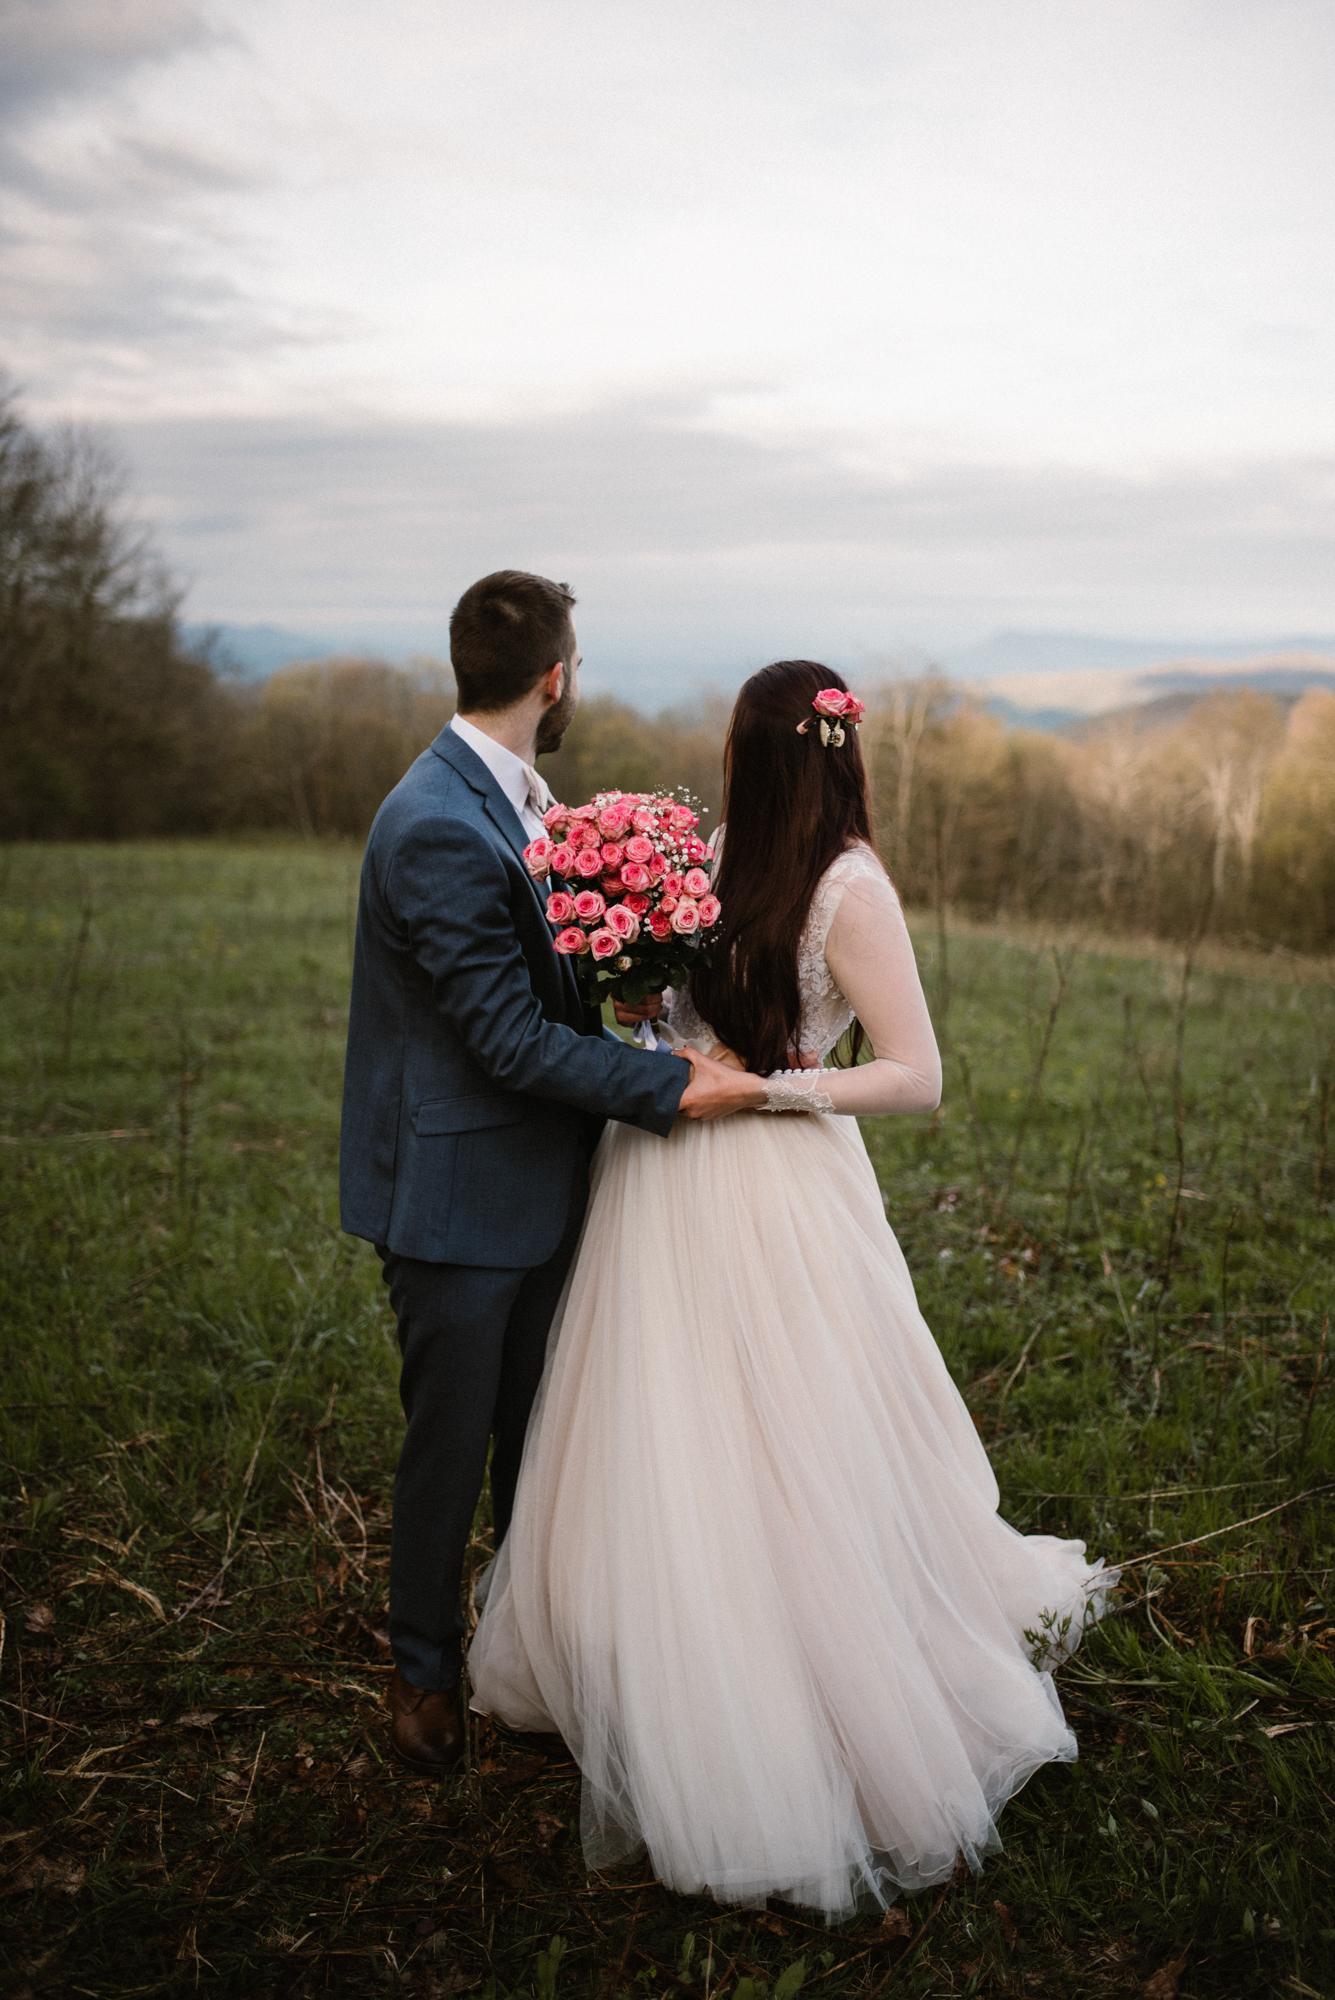 Paula and Andrew - Small Adventurous Wedding in Shenandoah National Park - Blue Ridge Mountain Wedding - White Sails Creative - Mountain Elopement_29.jpg